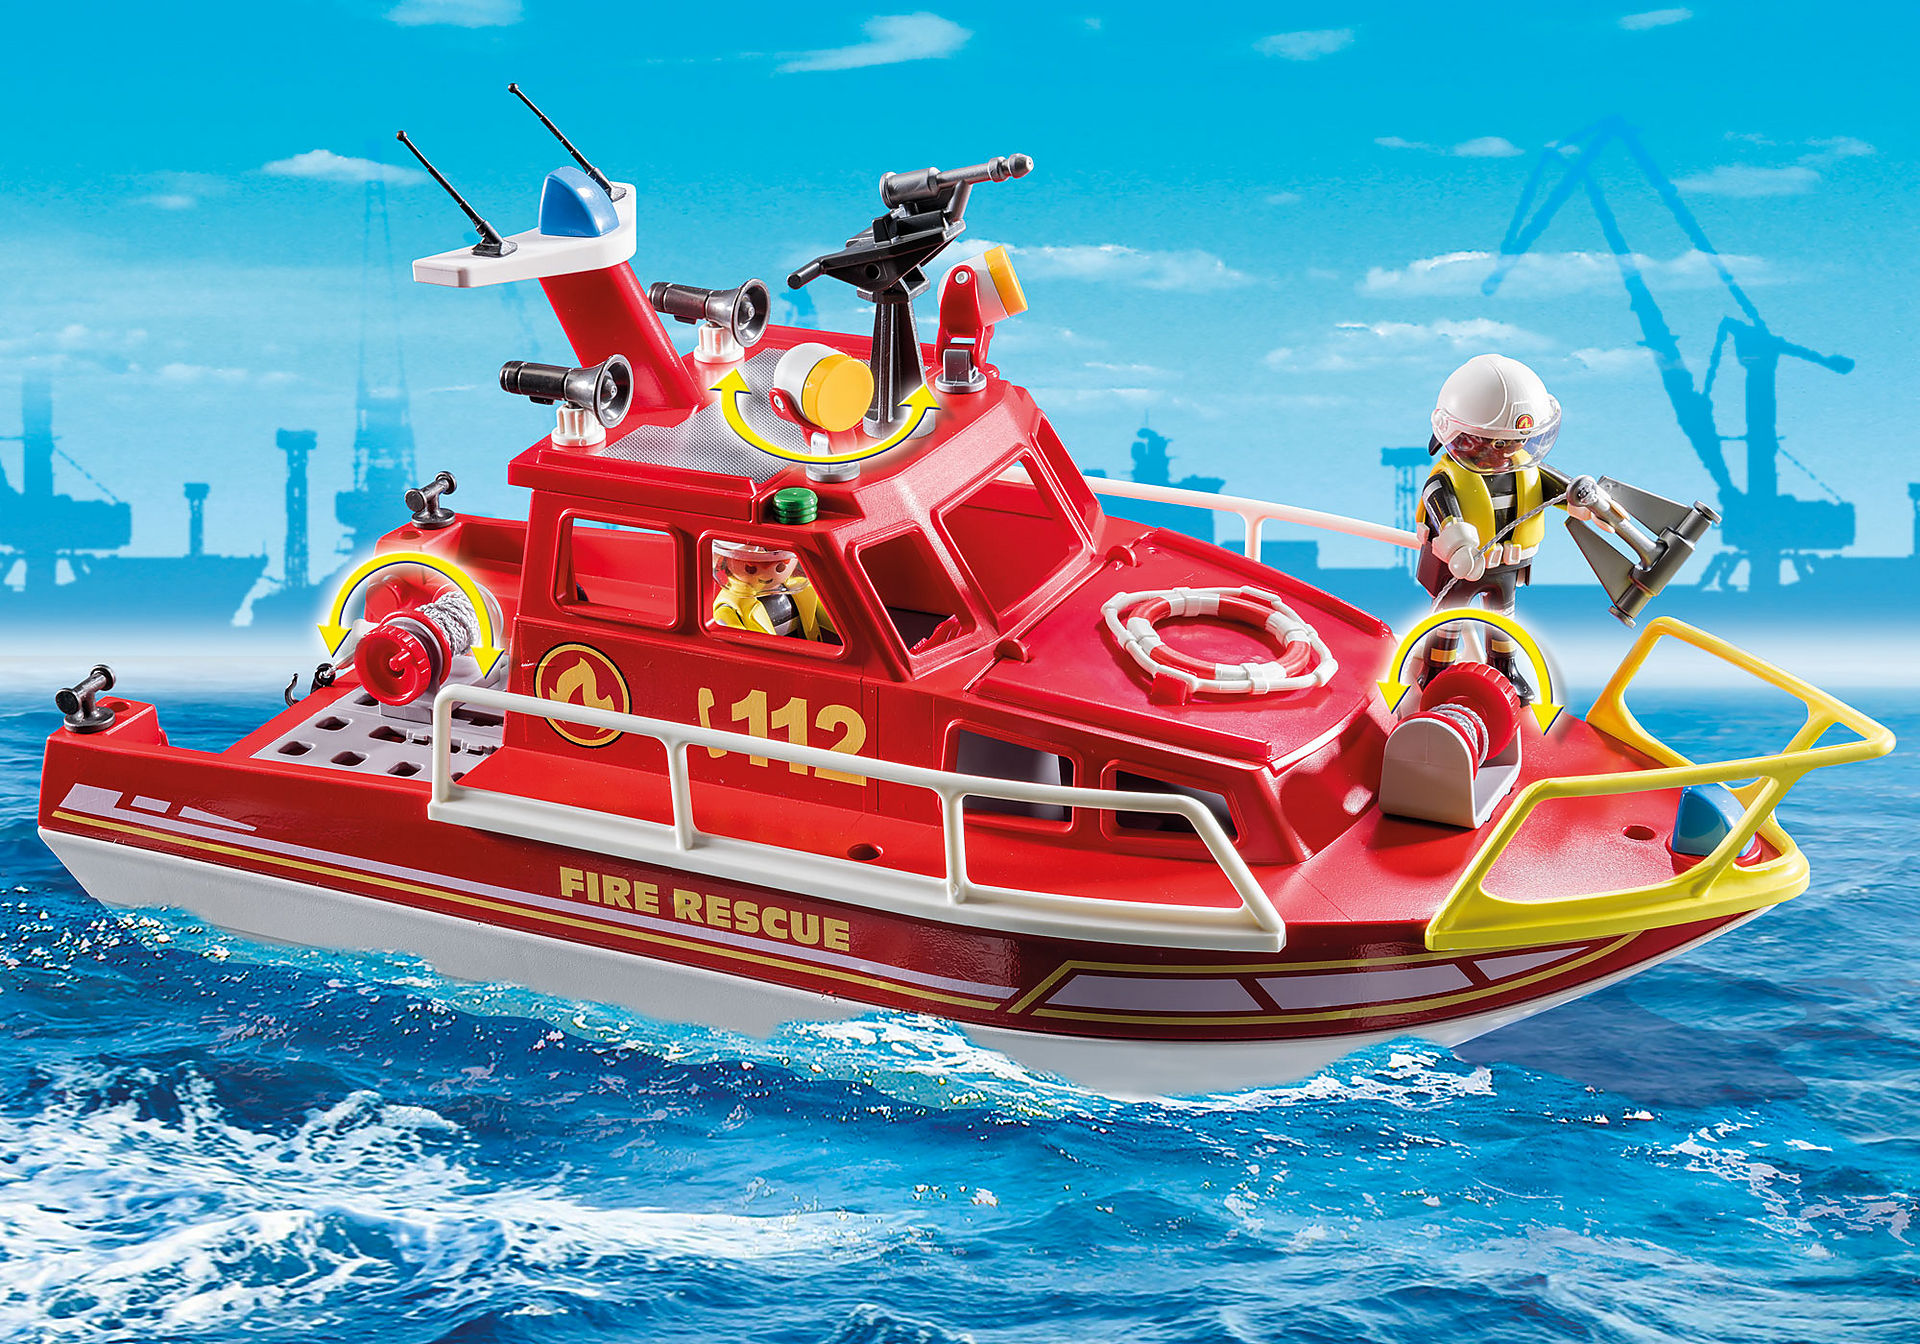 70147 Barco de Resgate dos Bombeiros zoom image6